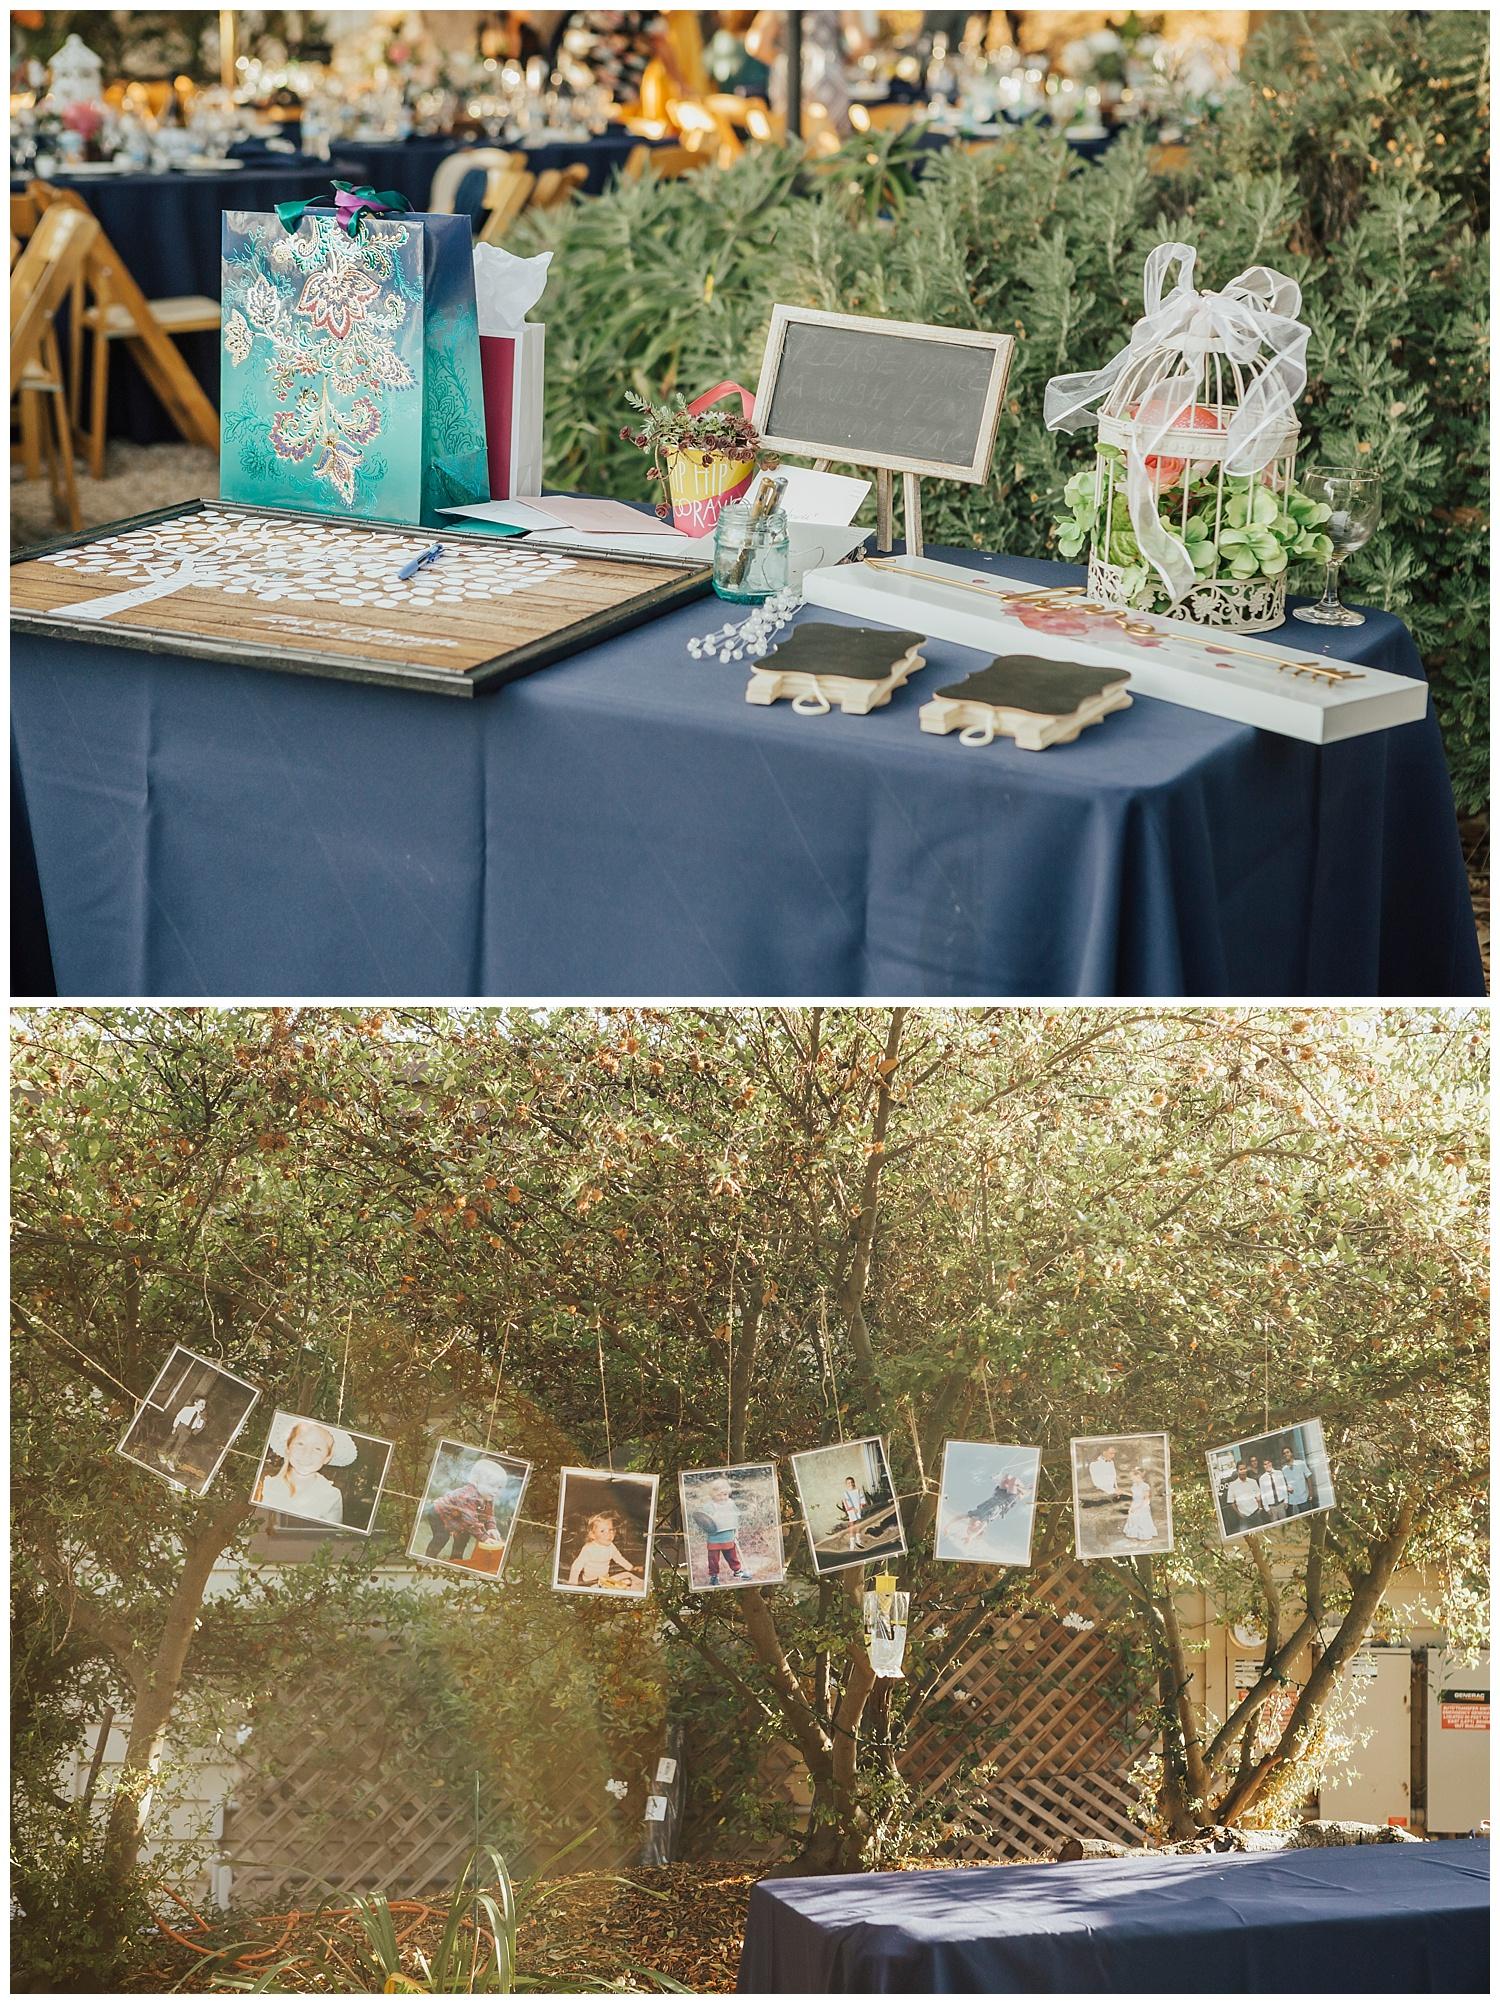 big-sur-wedding-fun-details-carol-oliva-photography.jpg